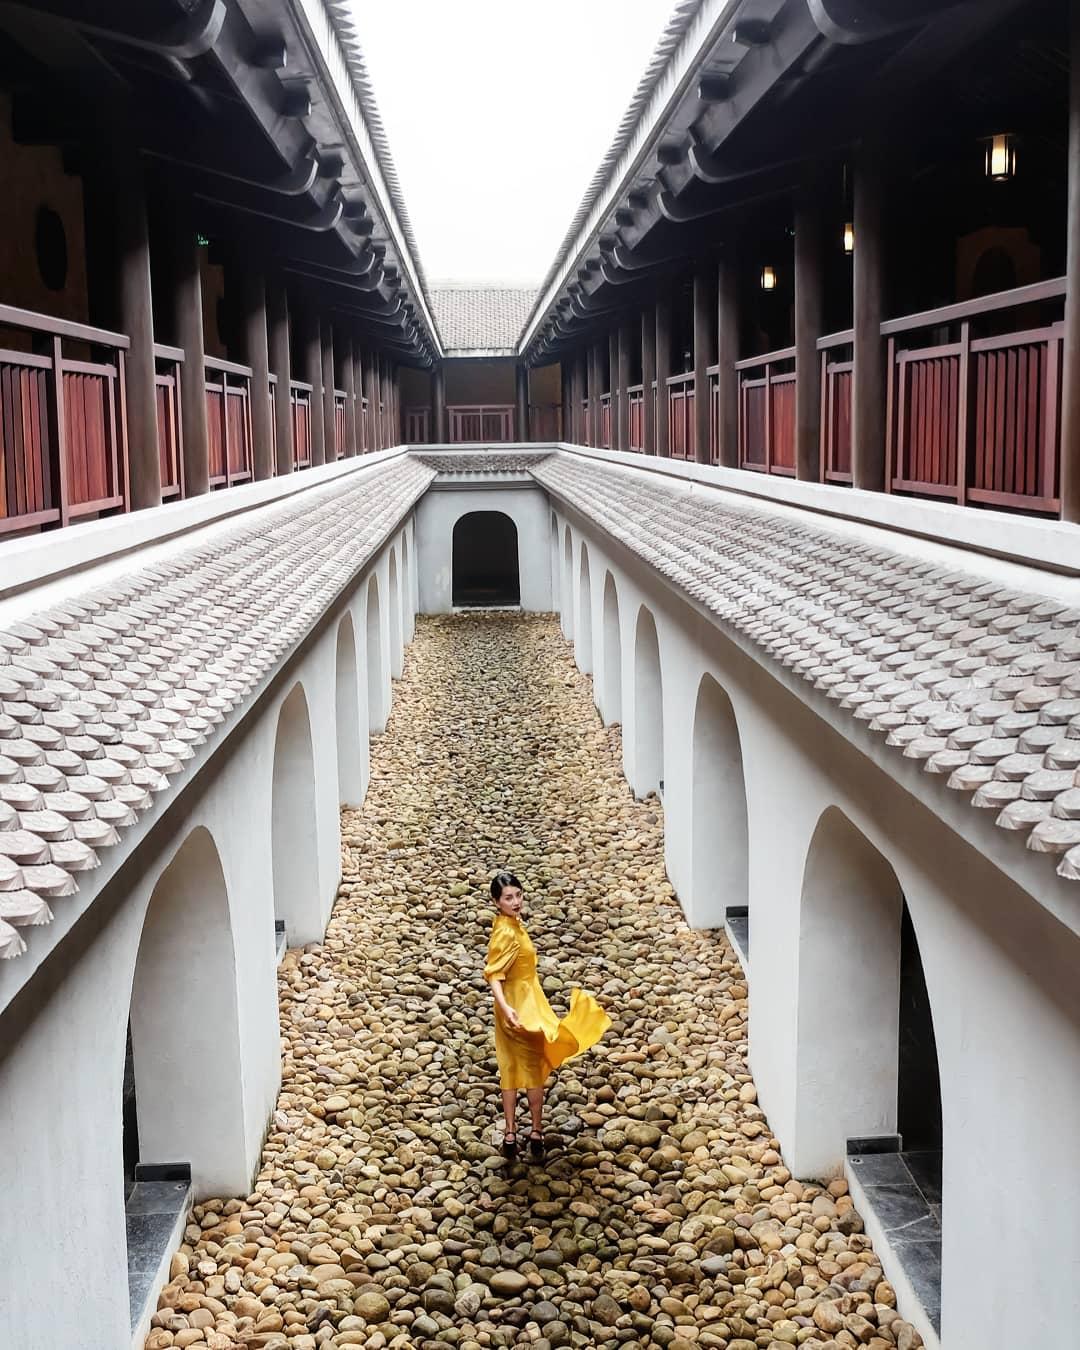 Quang-ninh-legacy-yen-tu-26